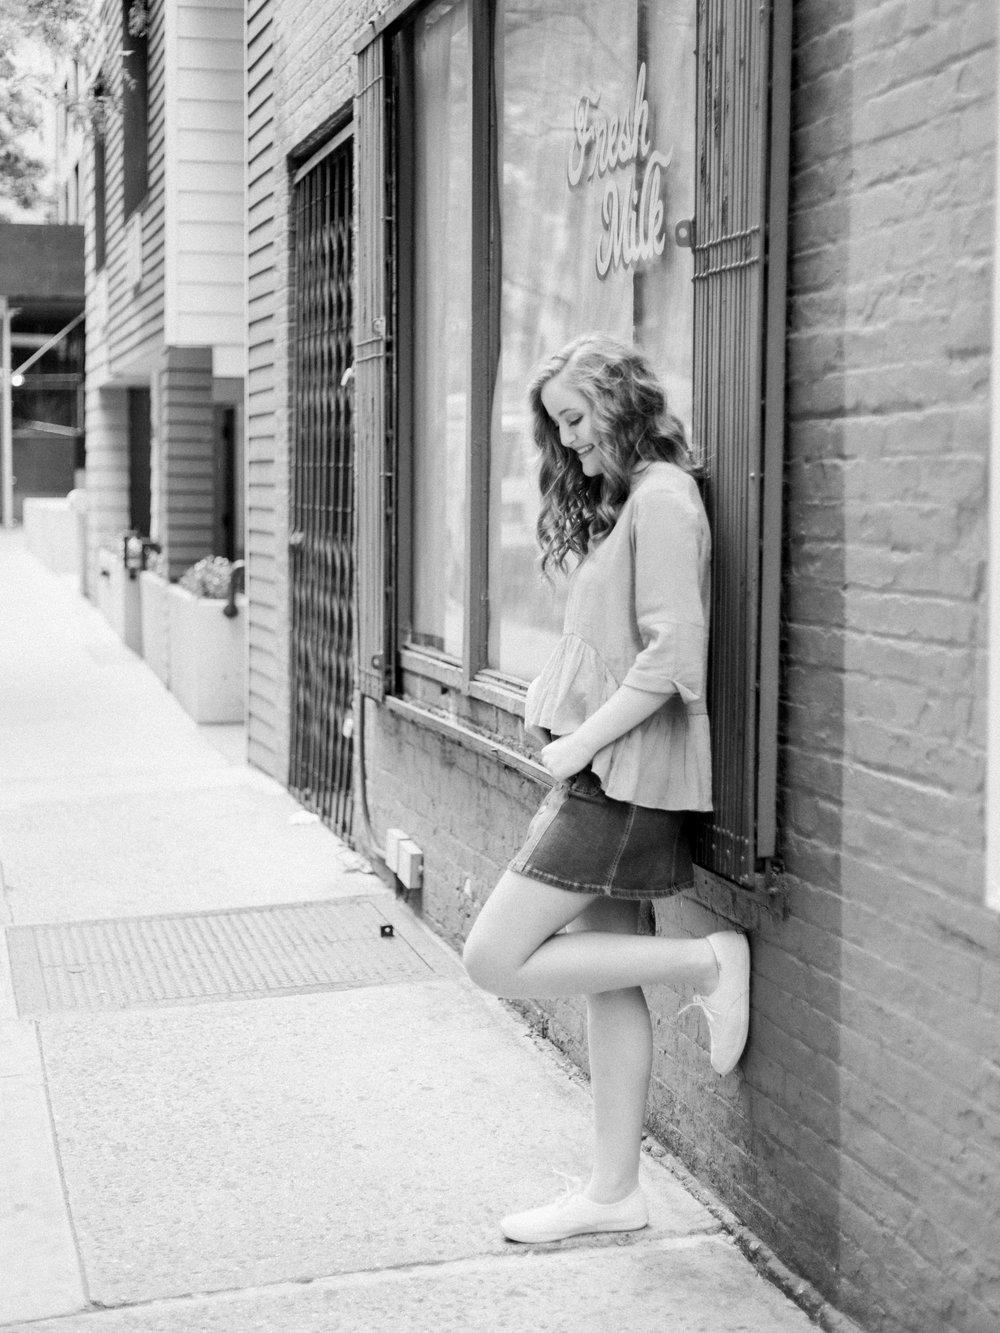 Urban Senior Photos in New York City by Cleveland Wedding Photographer Matt Erickson Photography